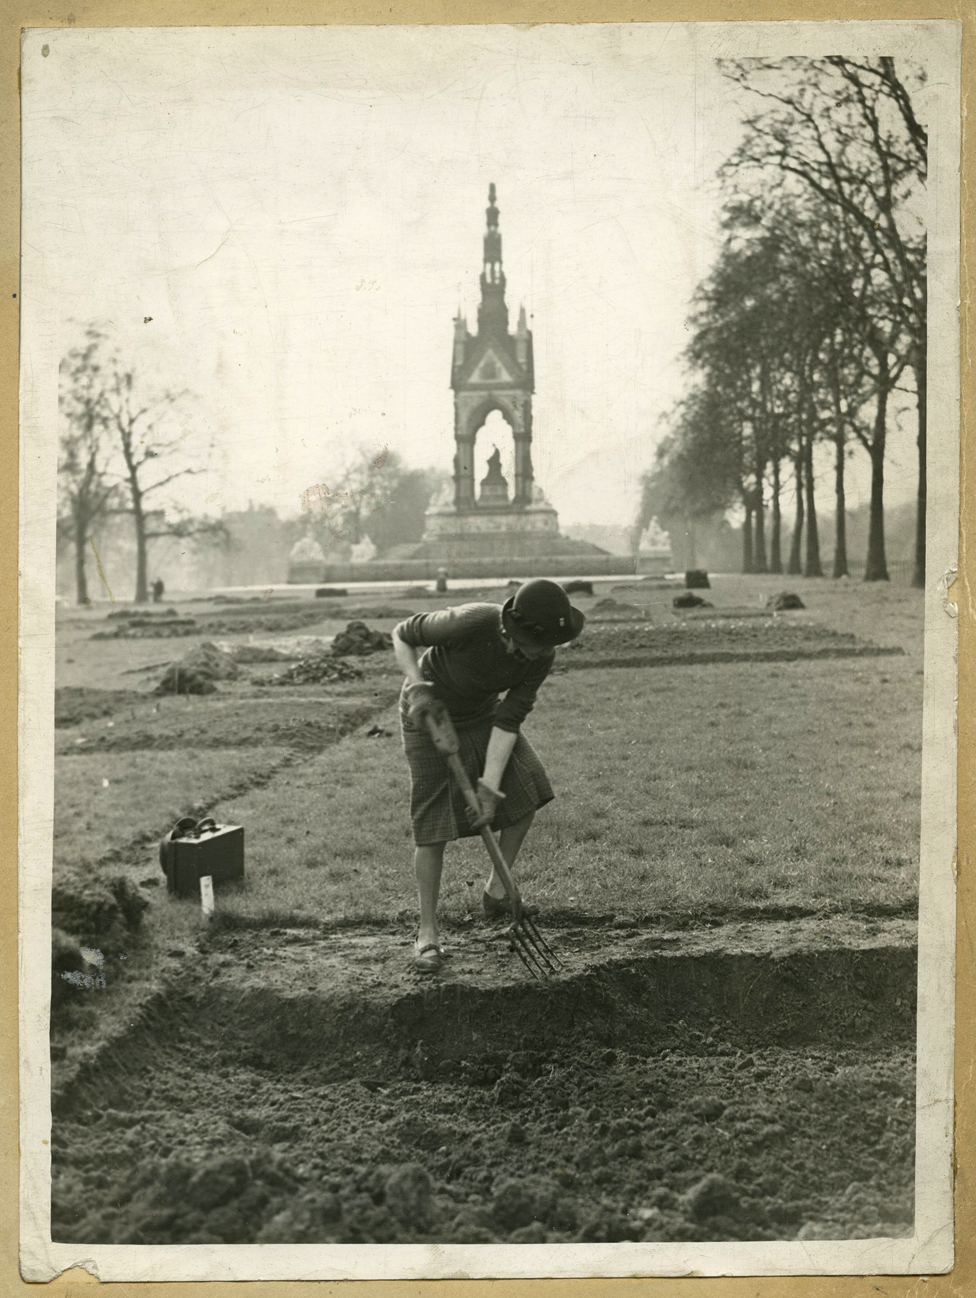 Izabel Bič kopa parcelu, a u pozadini je Albert memorijal u bašti Kensington u zapadnom Londonu